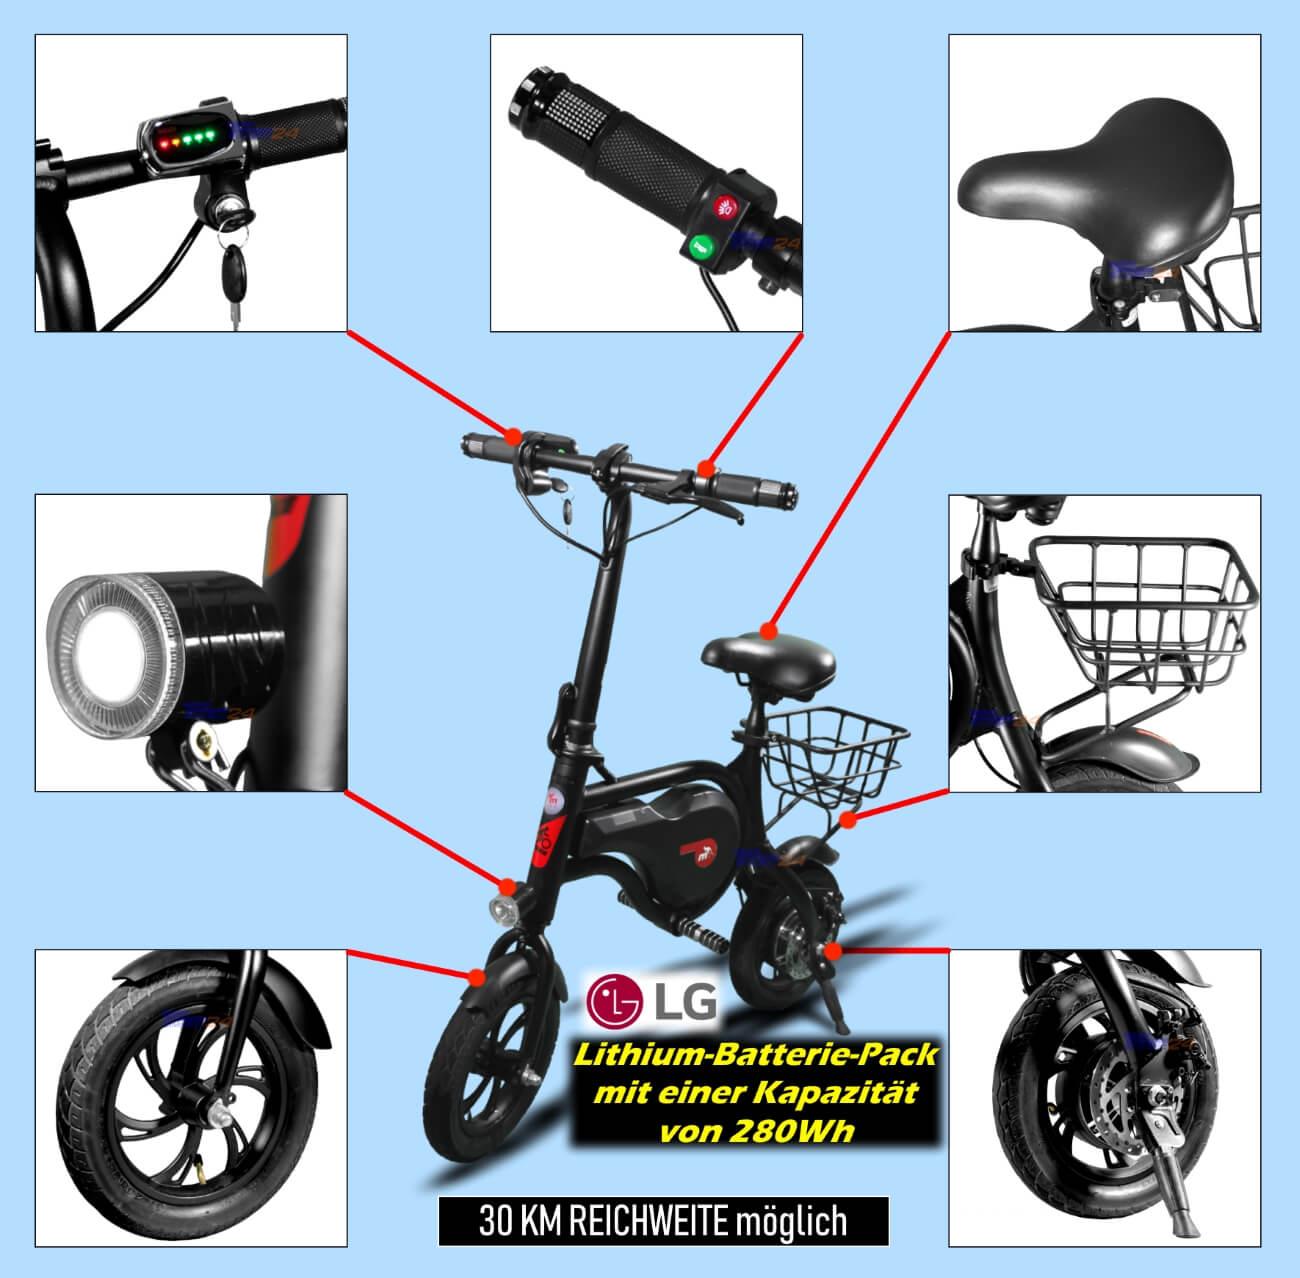 Bike-Details